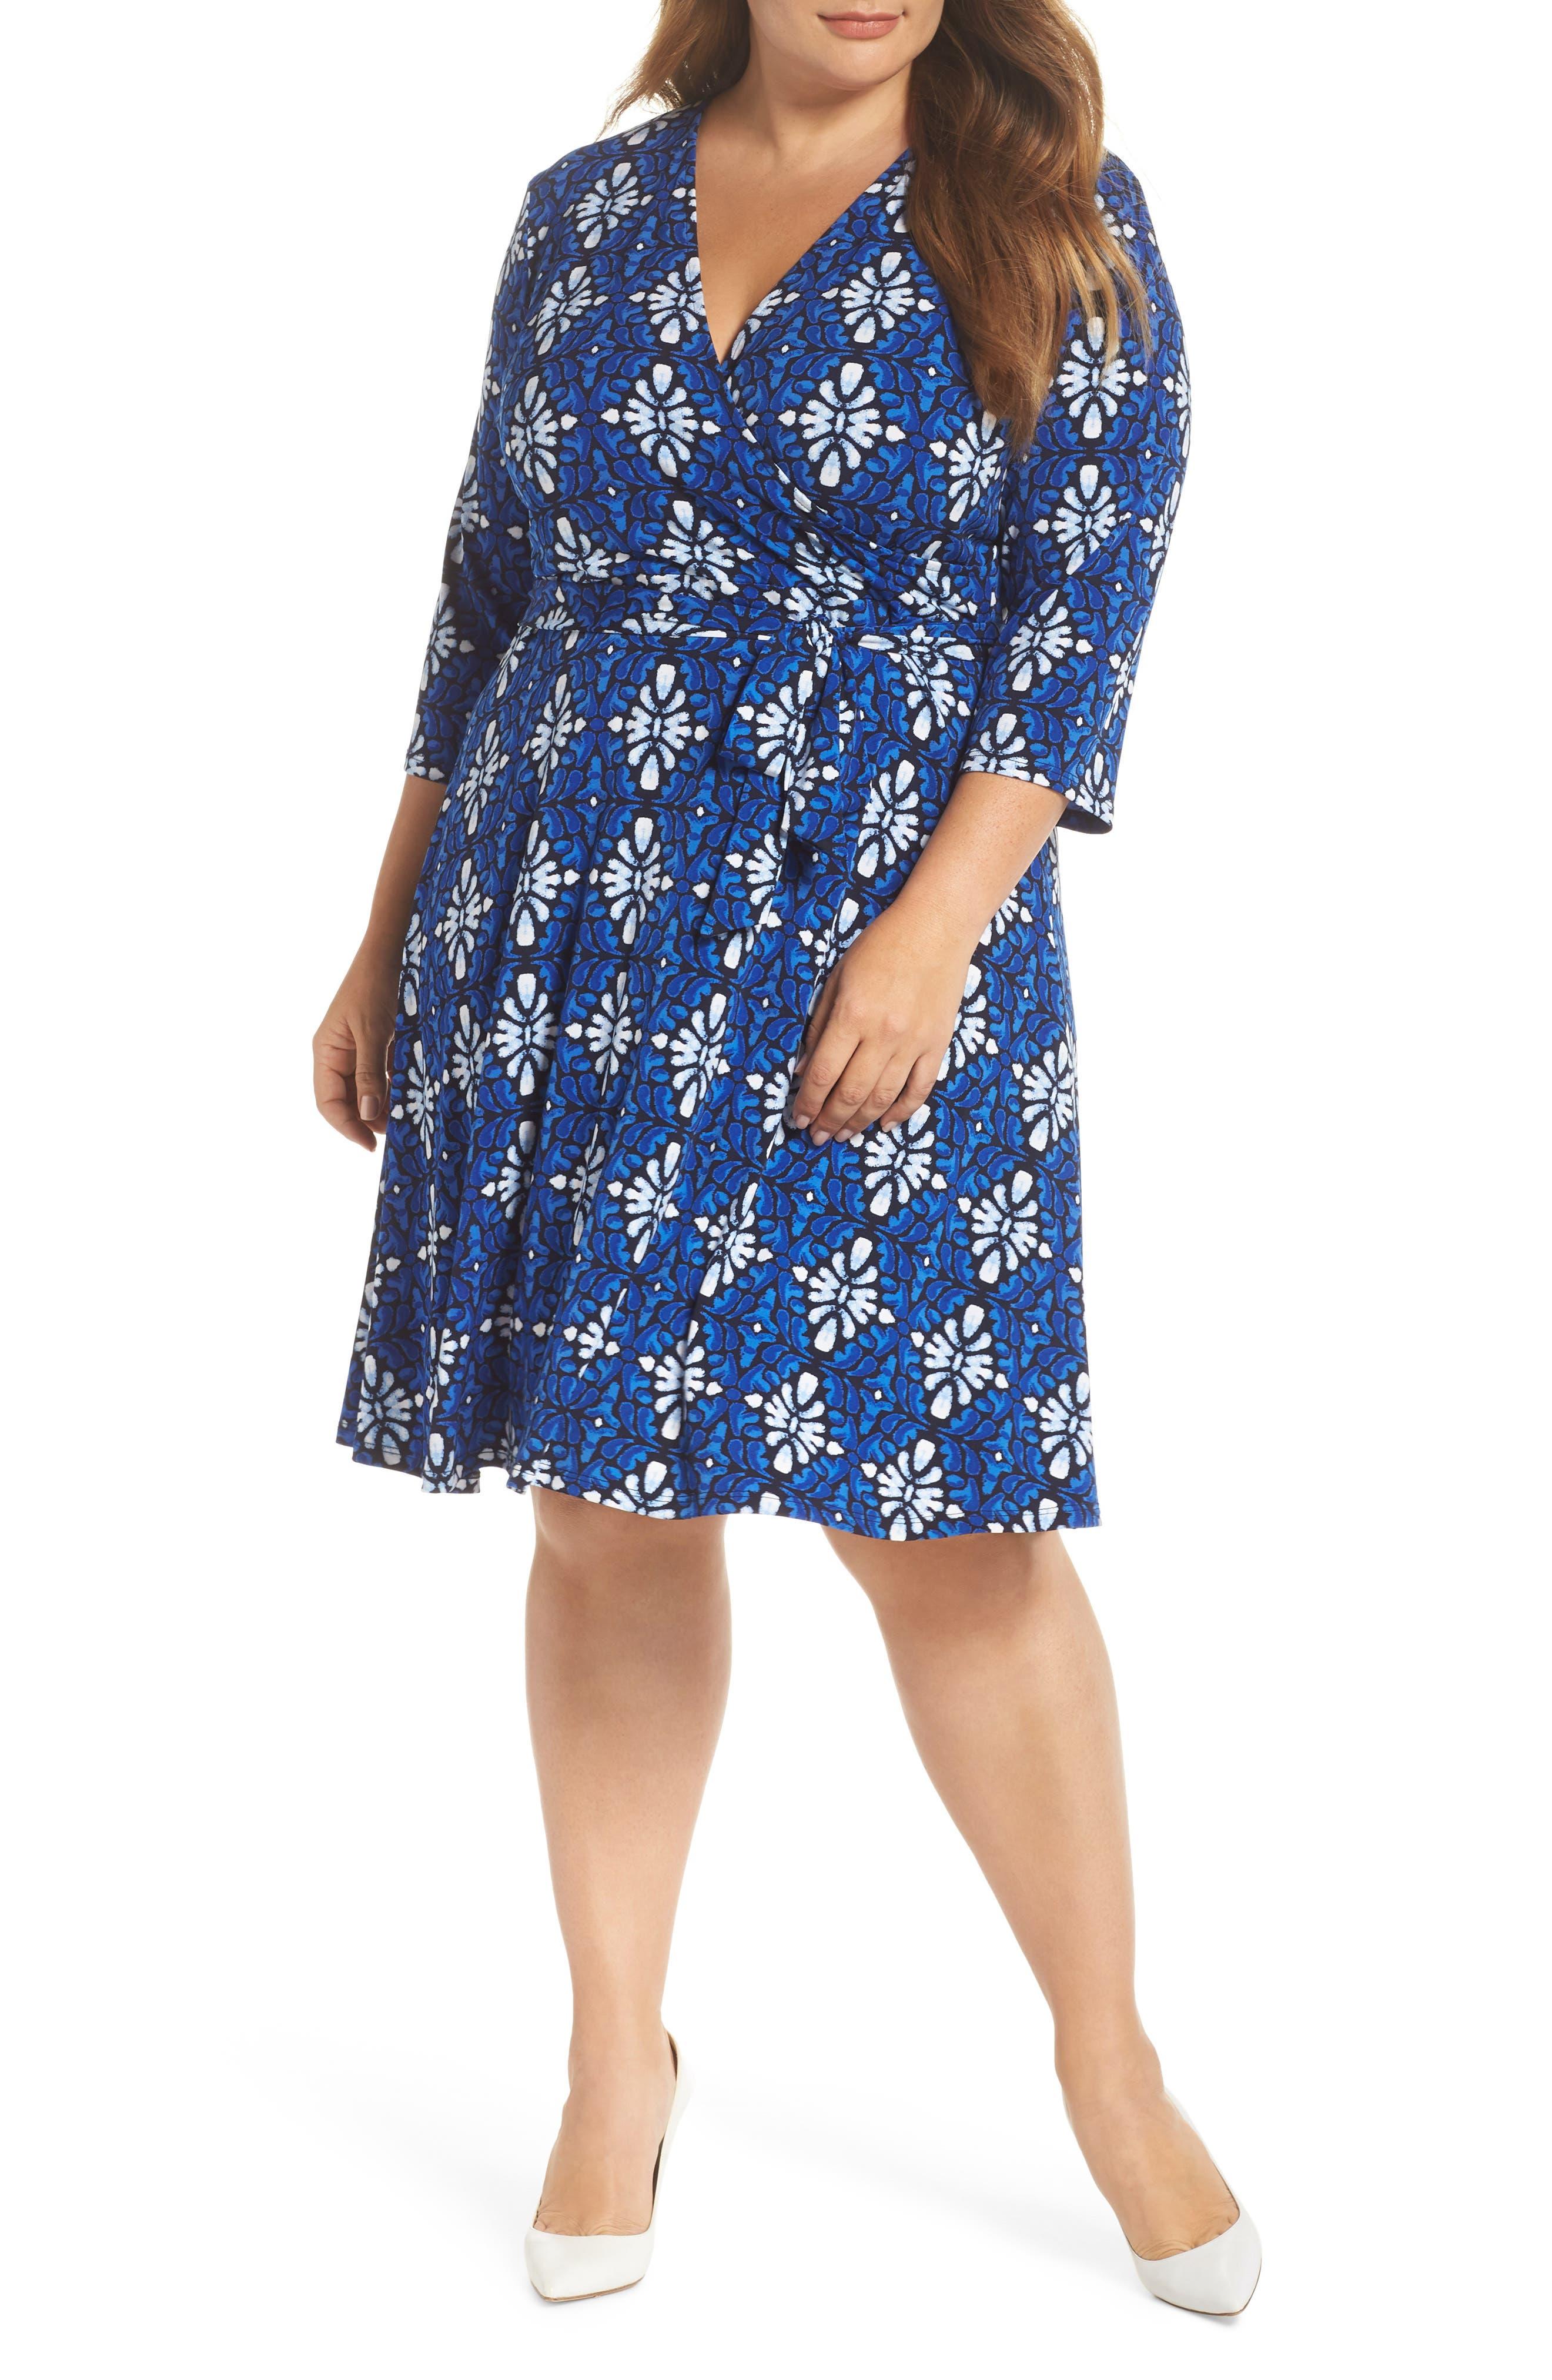 LEOTA Wrap Dress in Terrazzo Blue